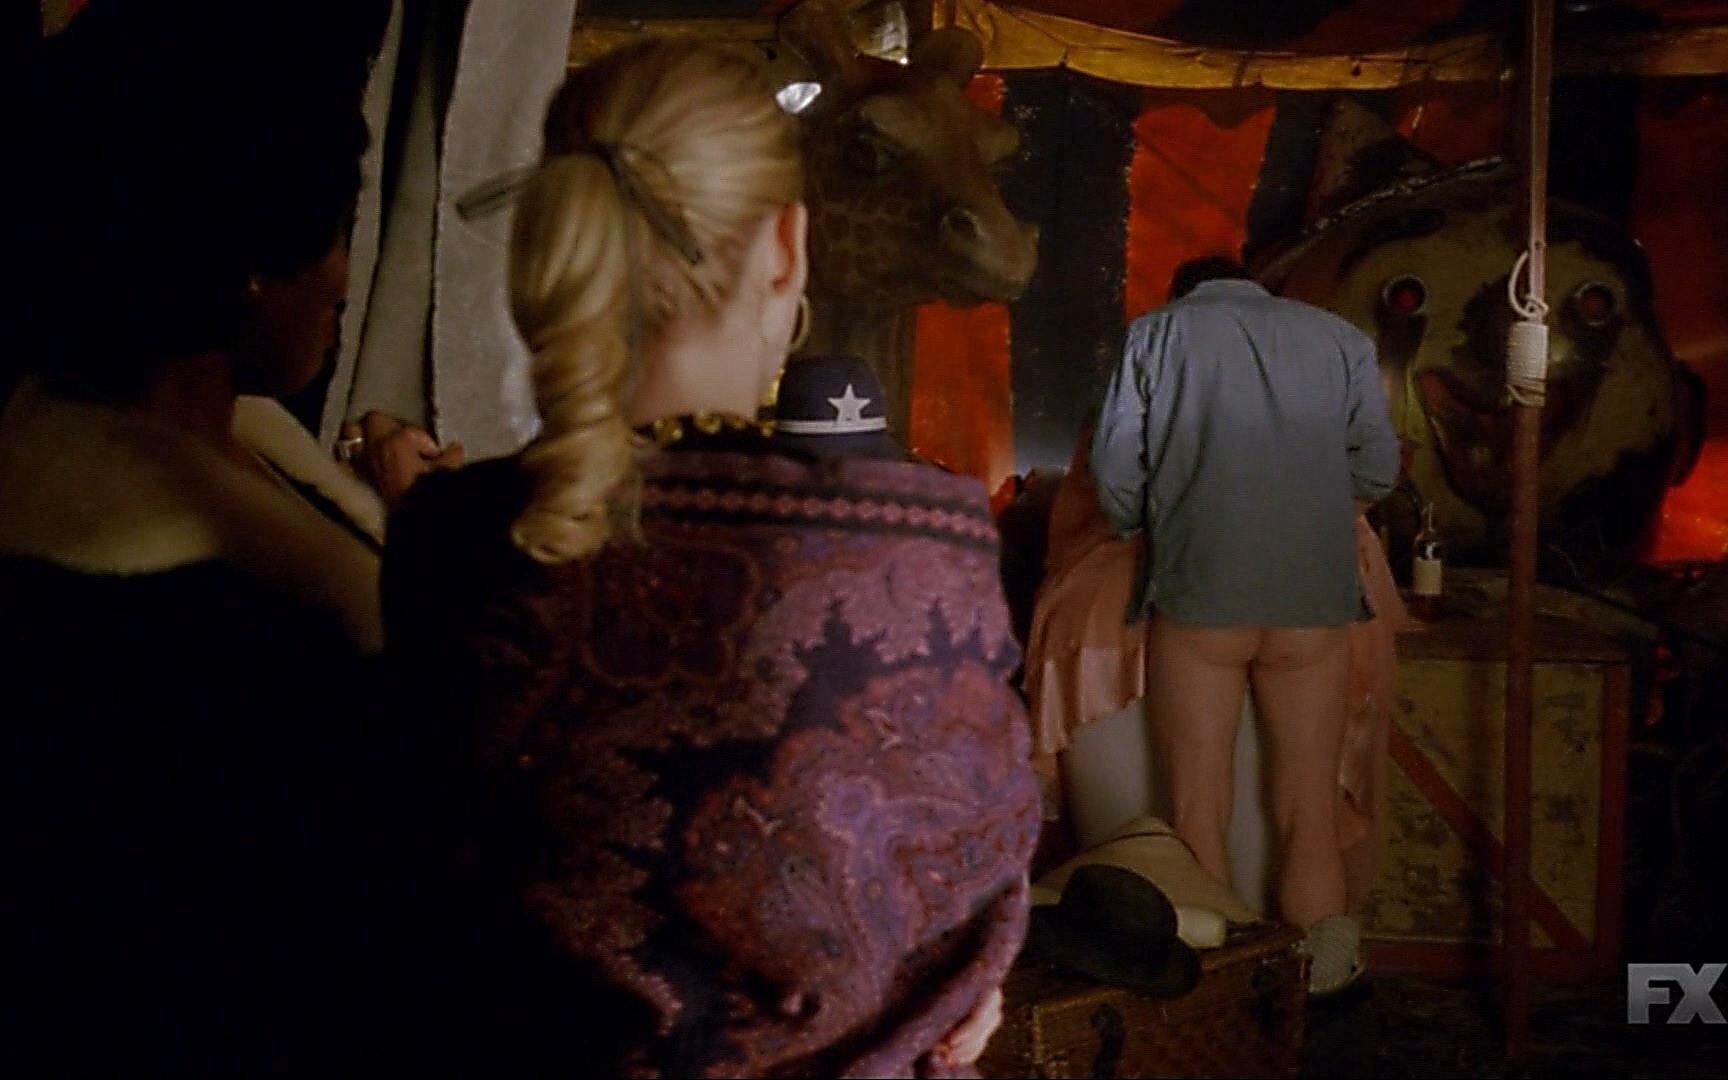 Finn Wittrock sexy shirtless scene January 3, 2015, 2pm